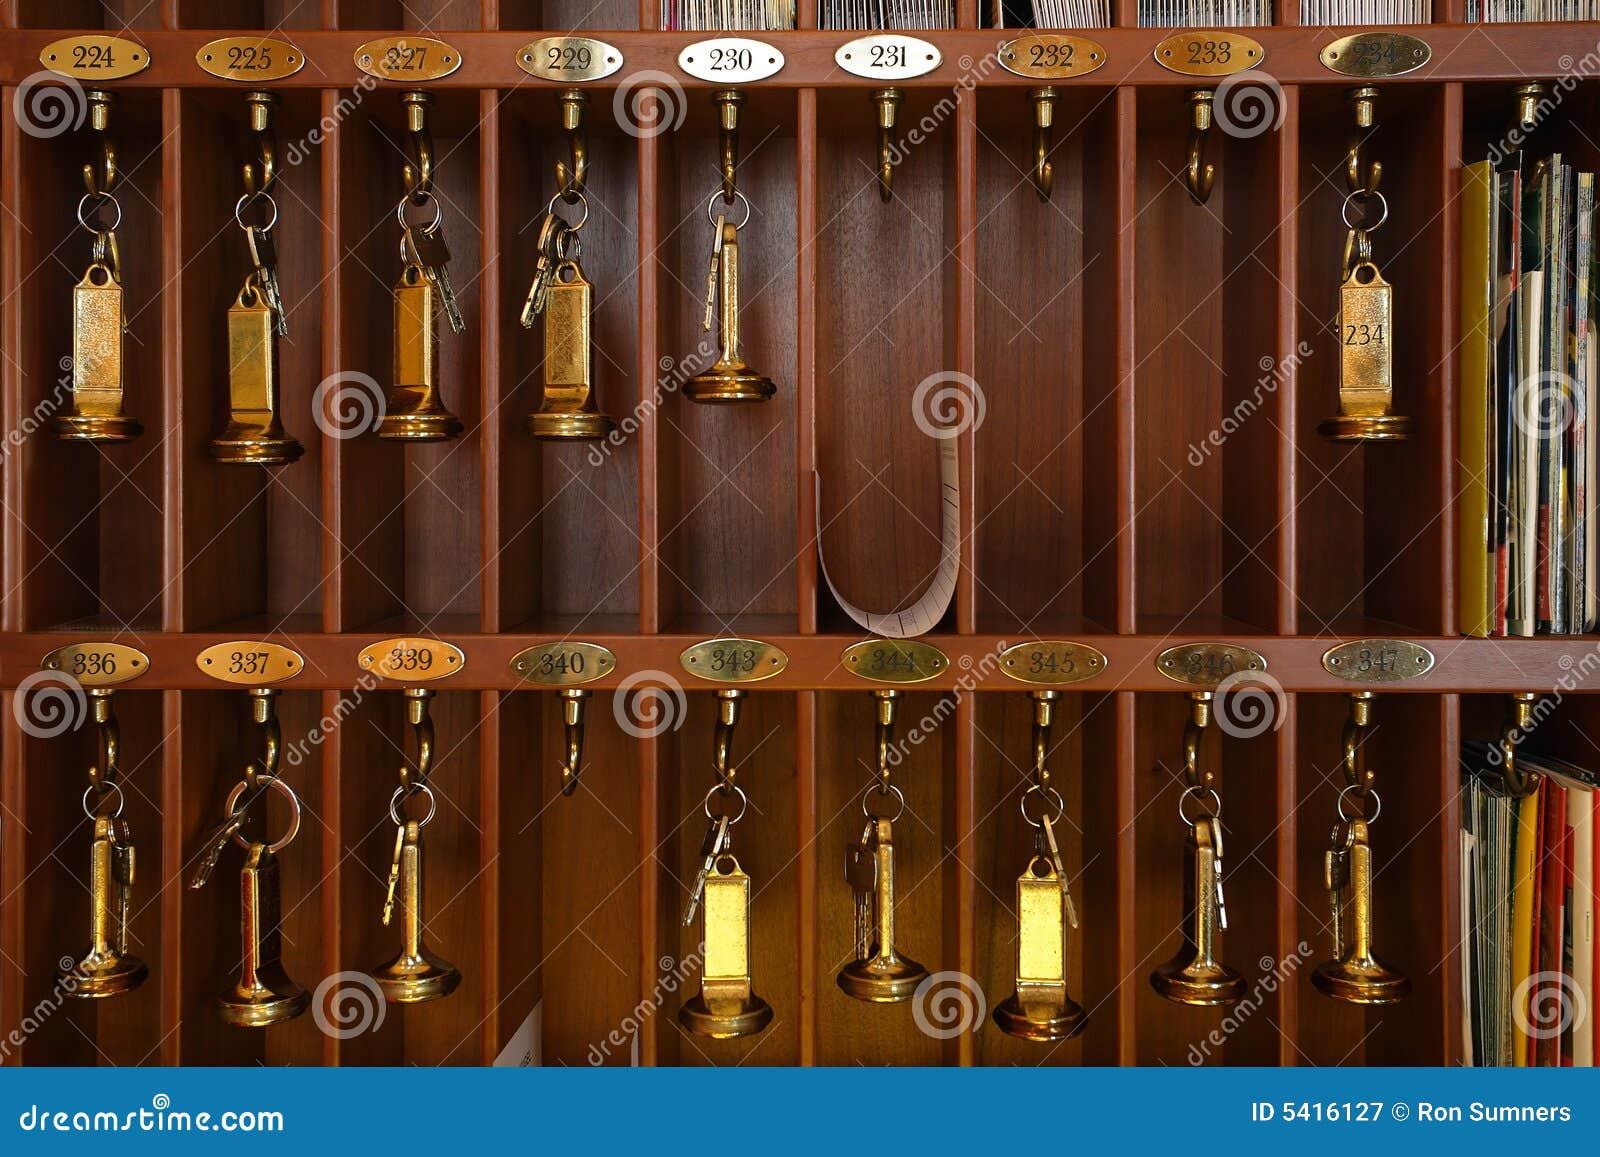 Hotel keys stock image image of vintage bronze rack 5416127 - Vintage hotel key rack ...